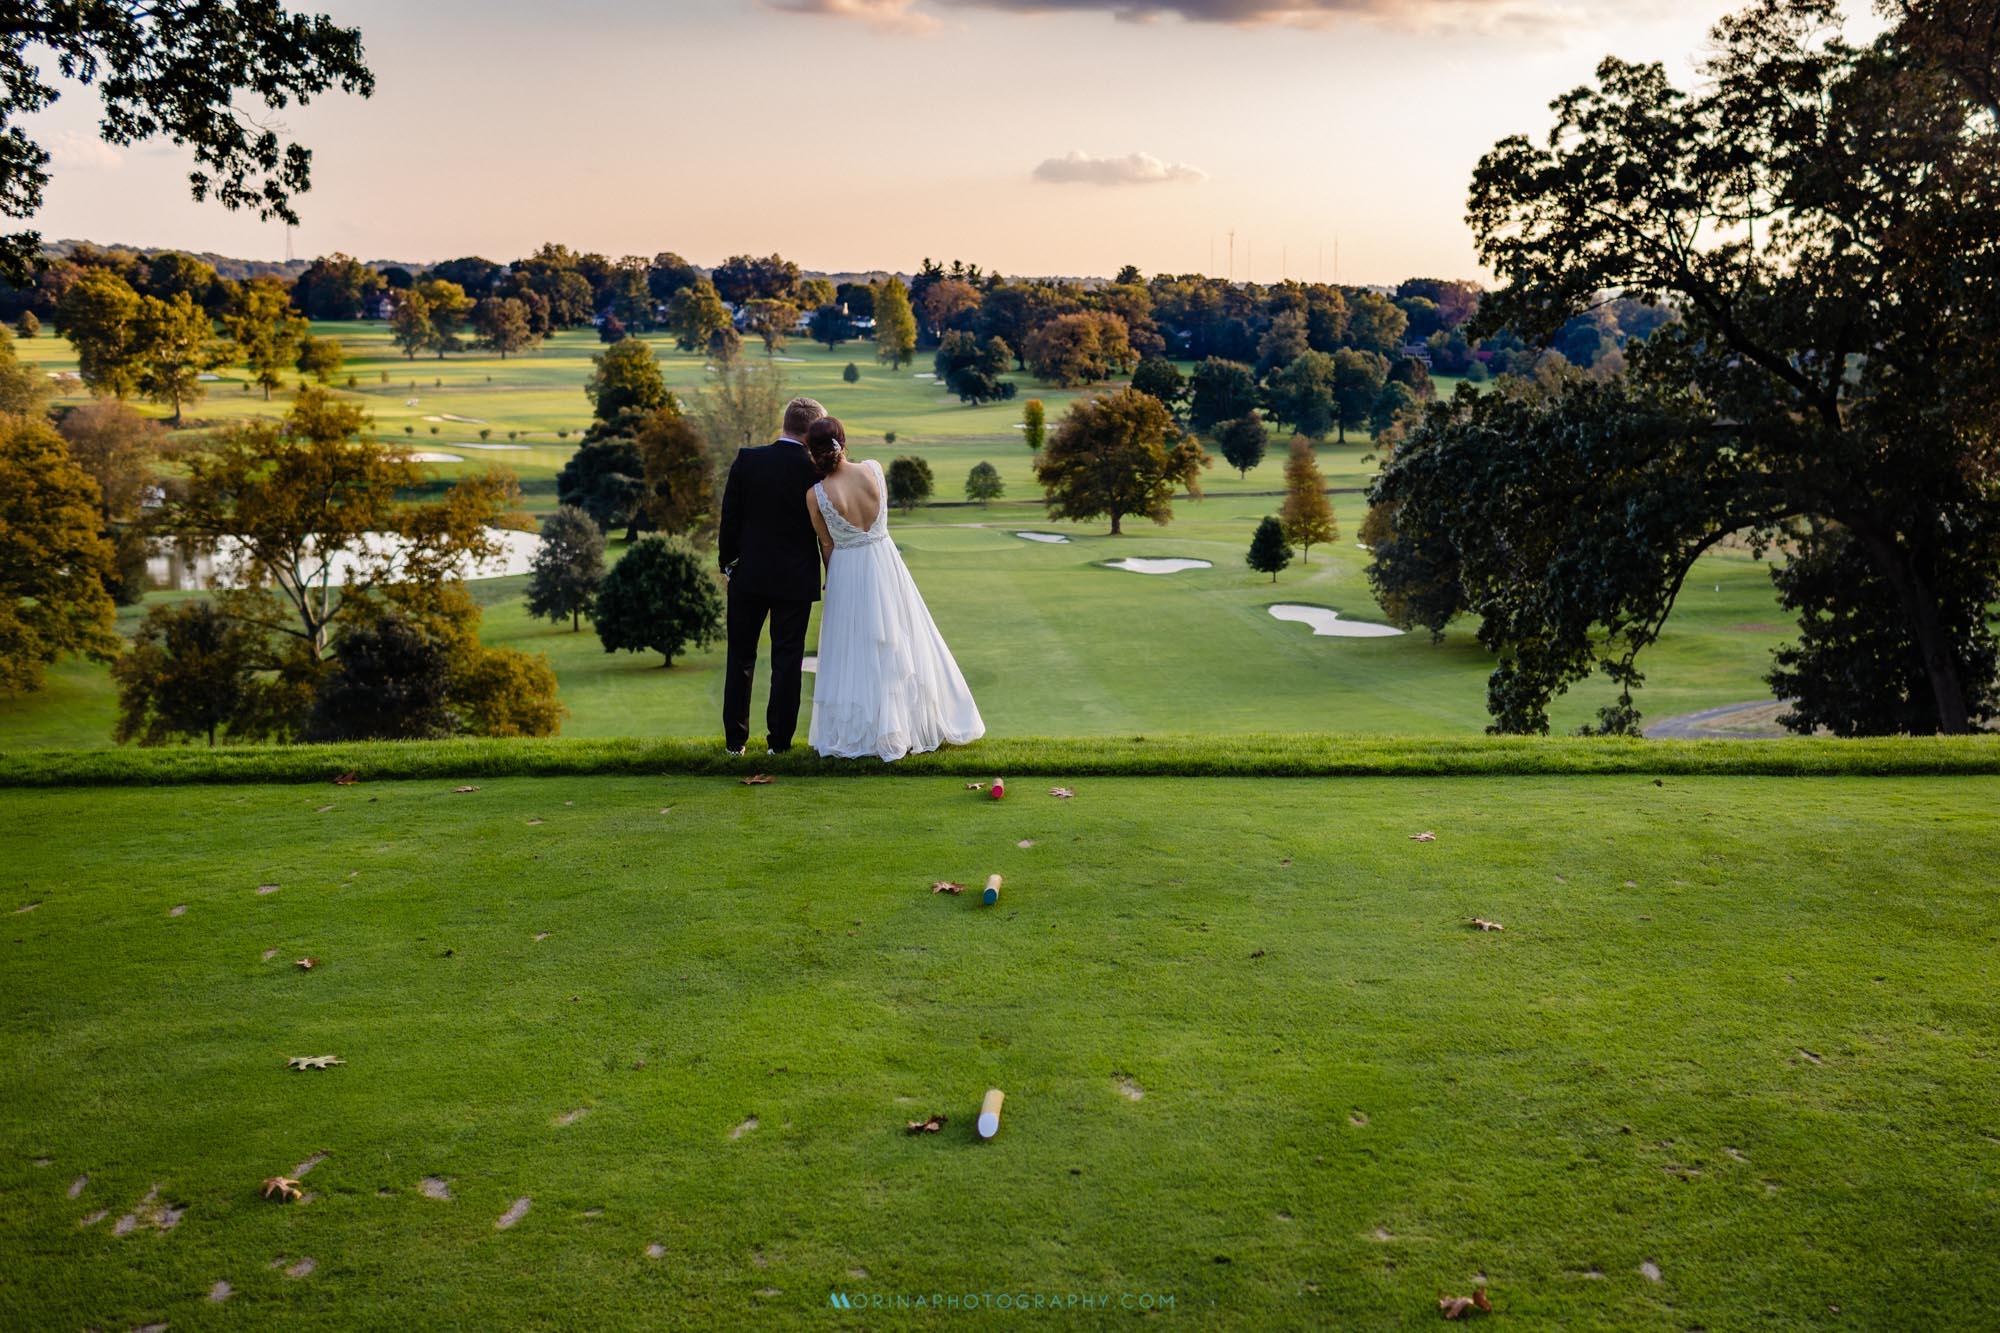 Colleen & Bill Wedding at Manufacturers' Golf & Country Club wedding 0063.jpg